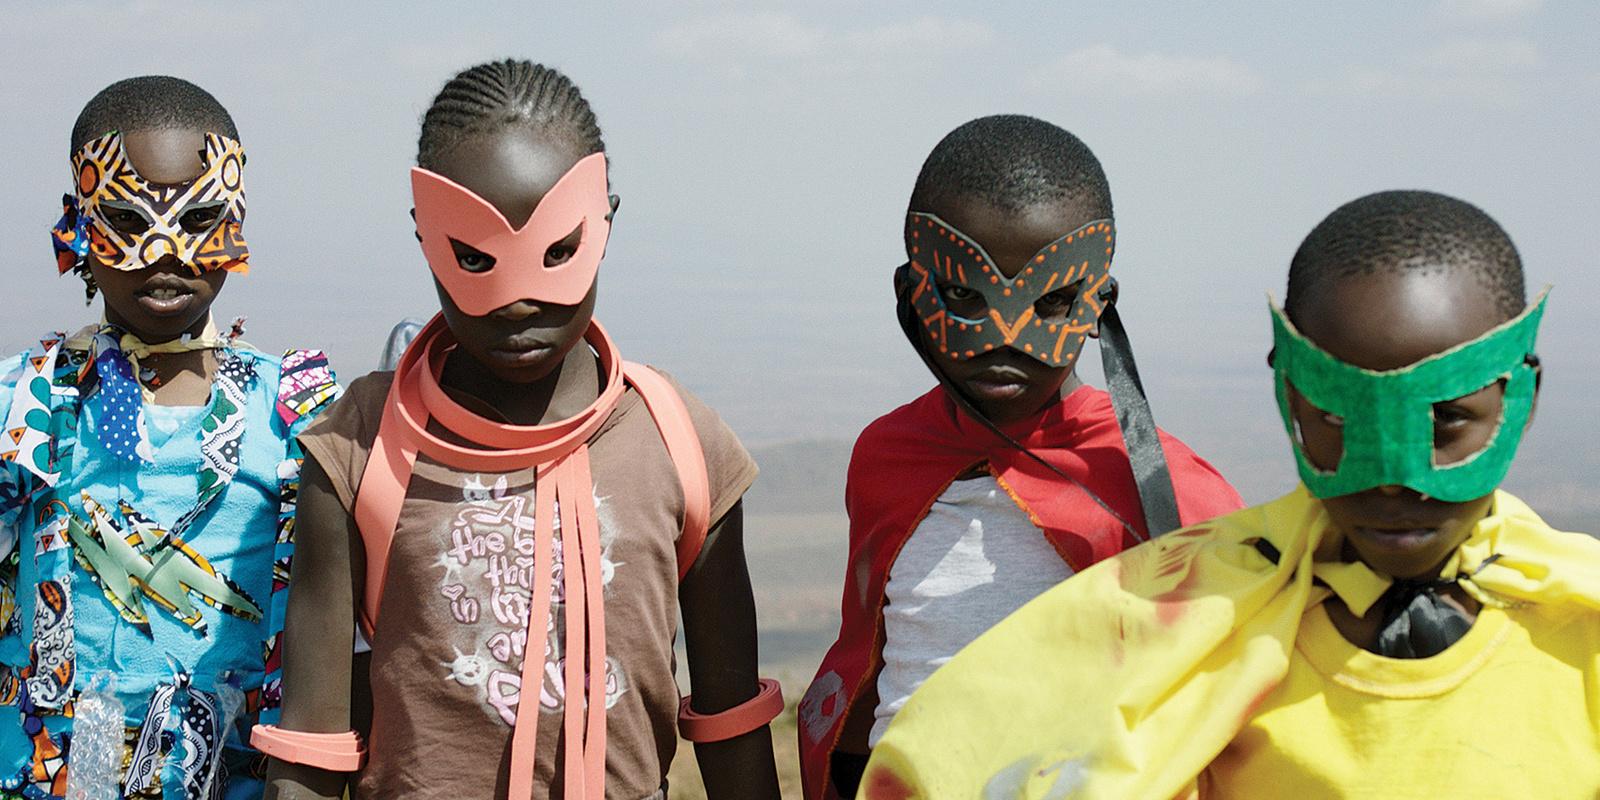 Supa Modo (Likarion Wainaina, 2018) STREAMING ONLINE